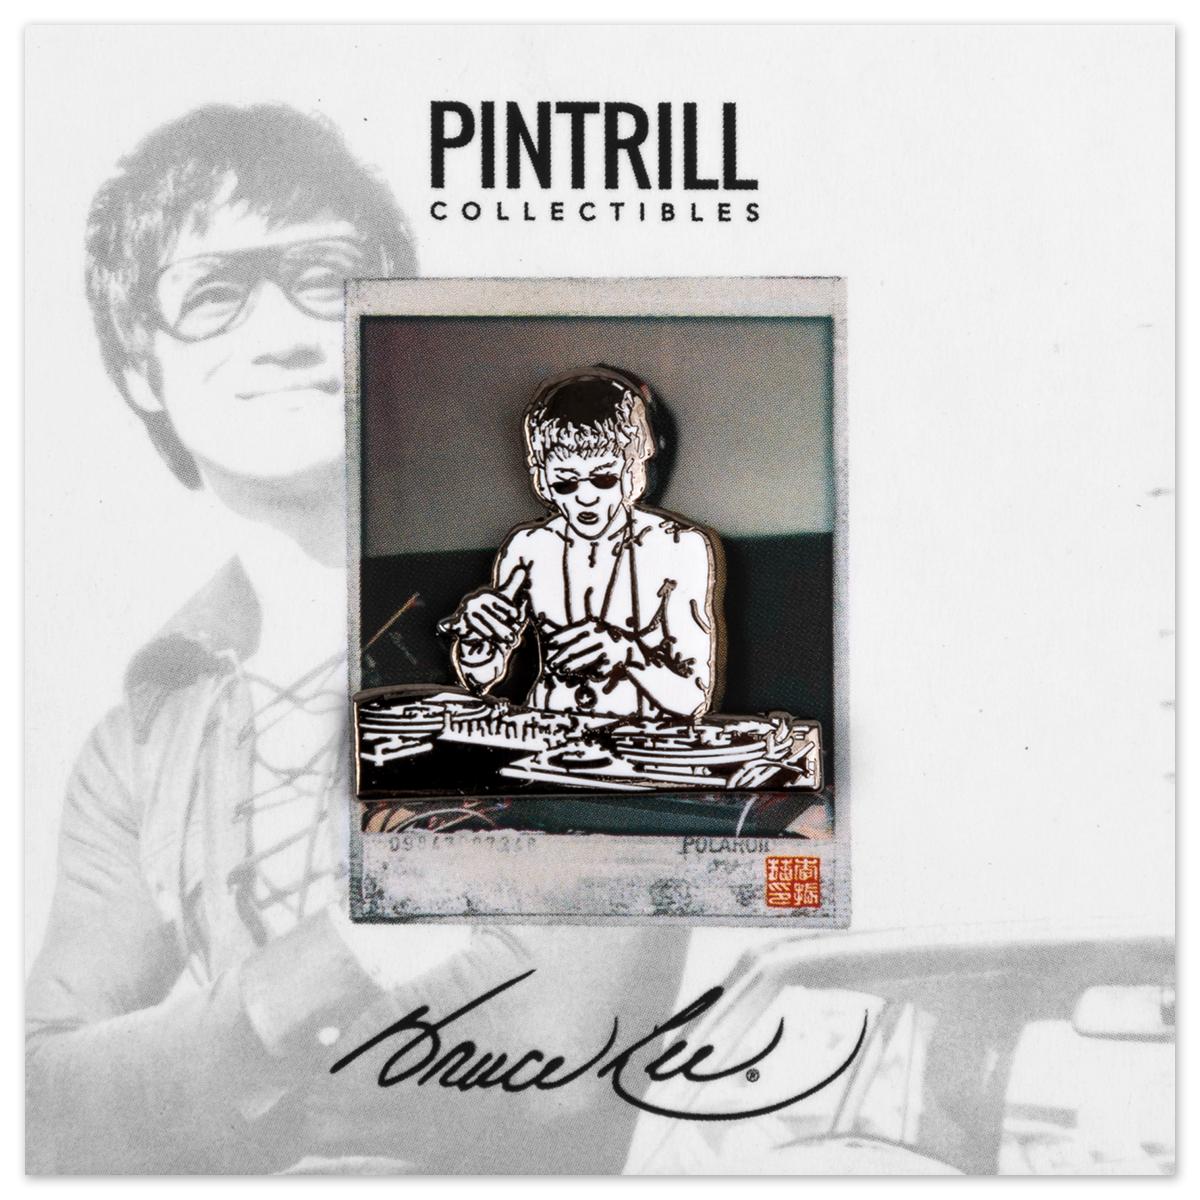 DJ Dragon Pin x PINTRILL